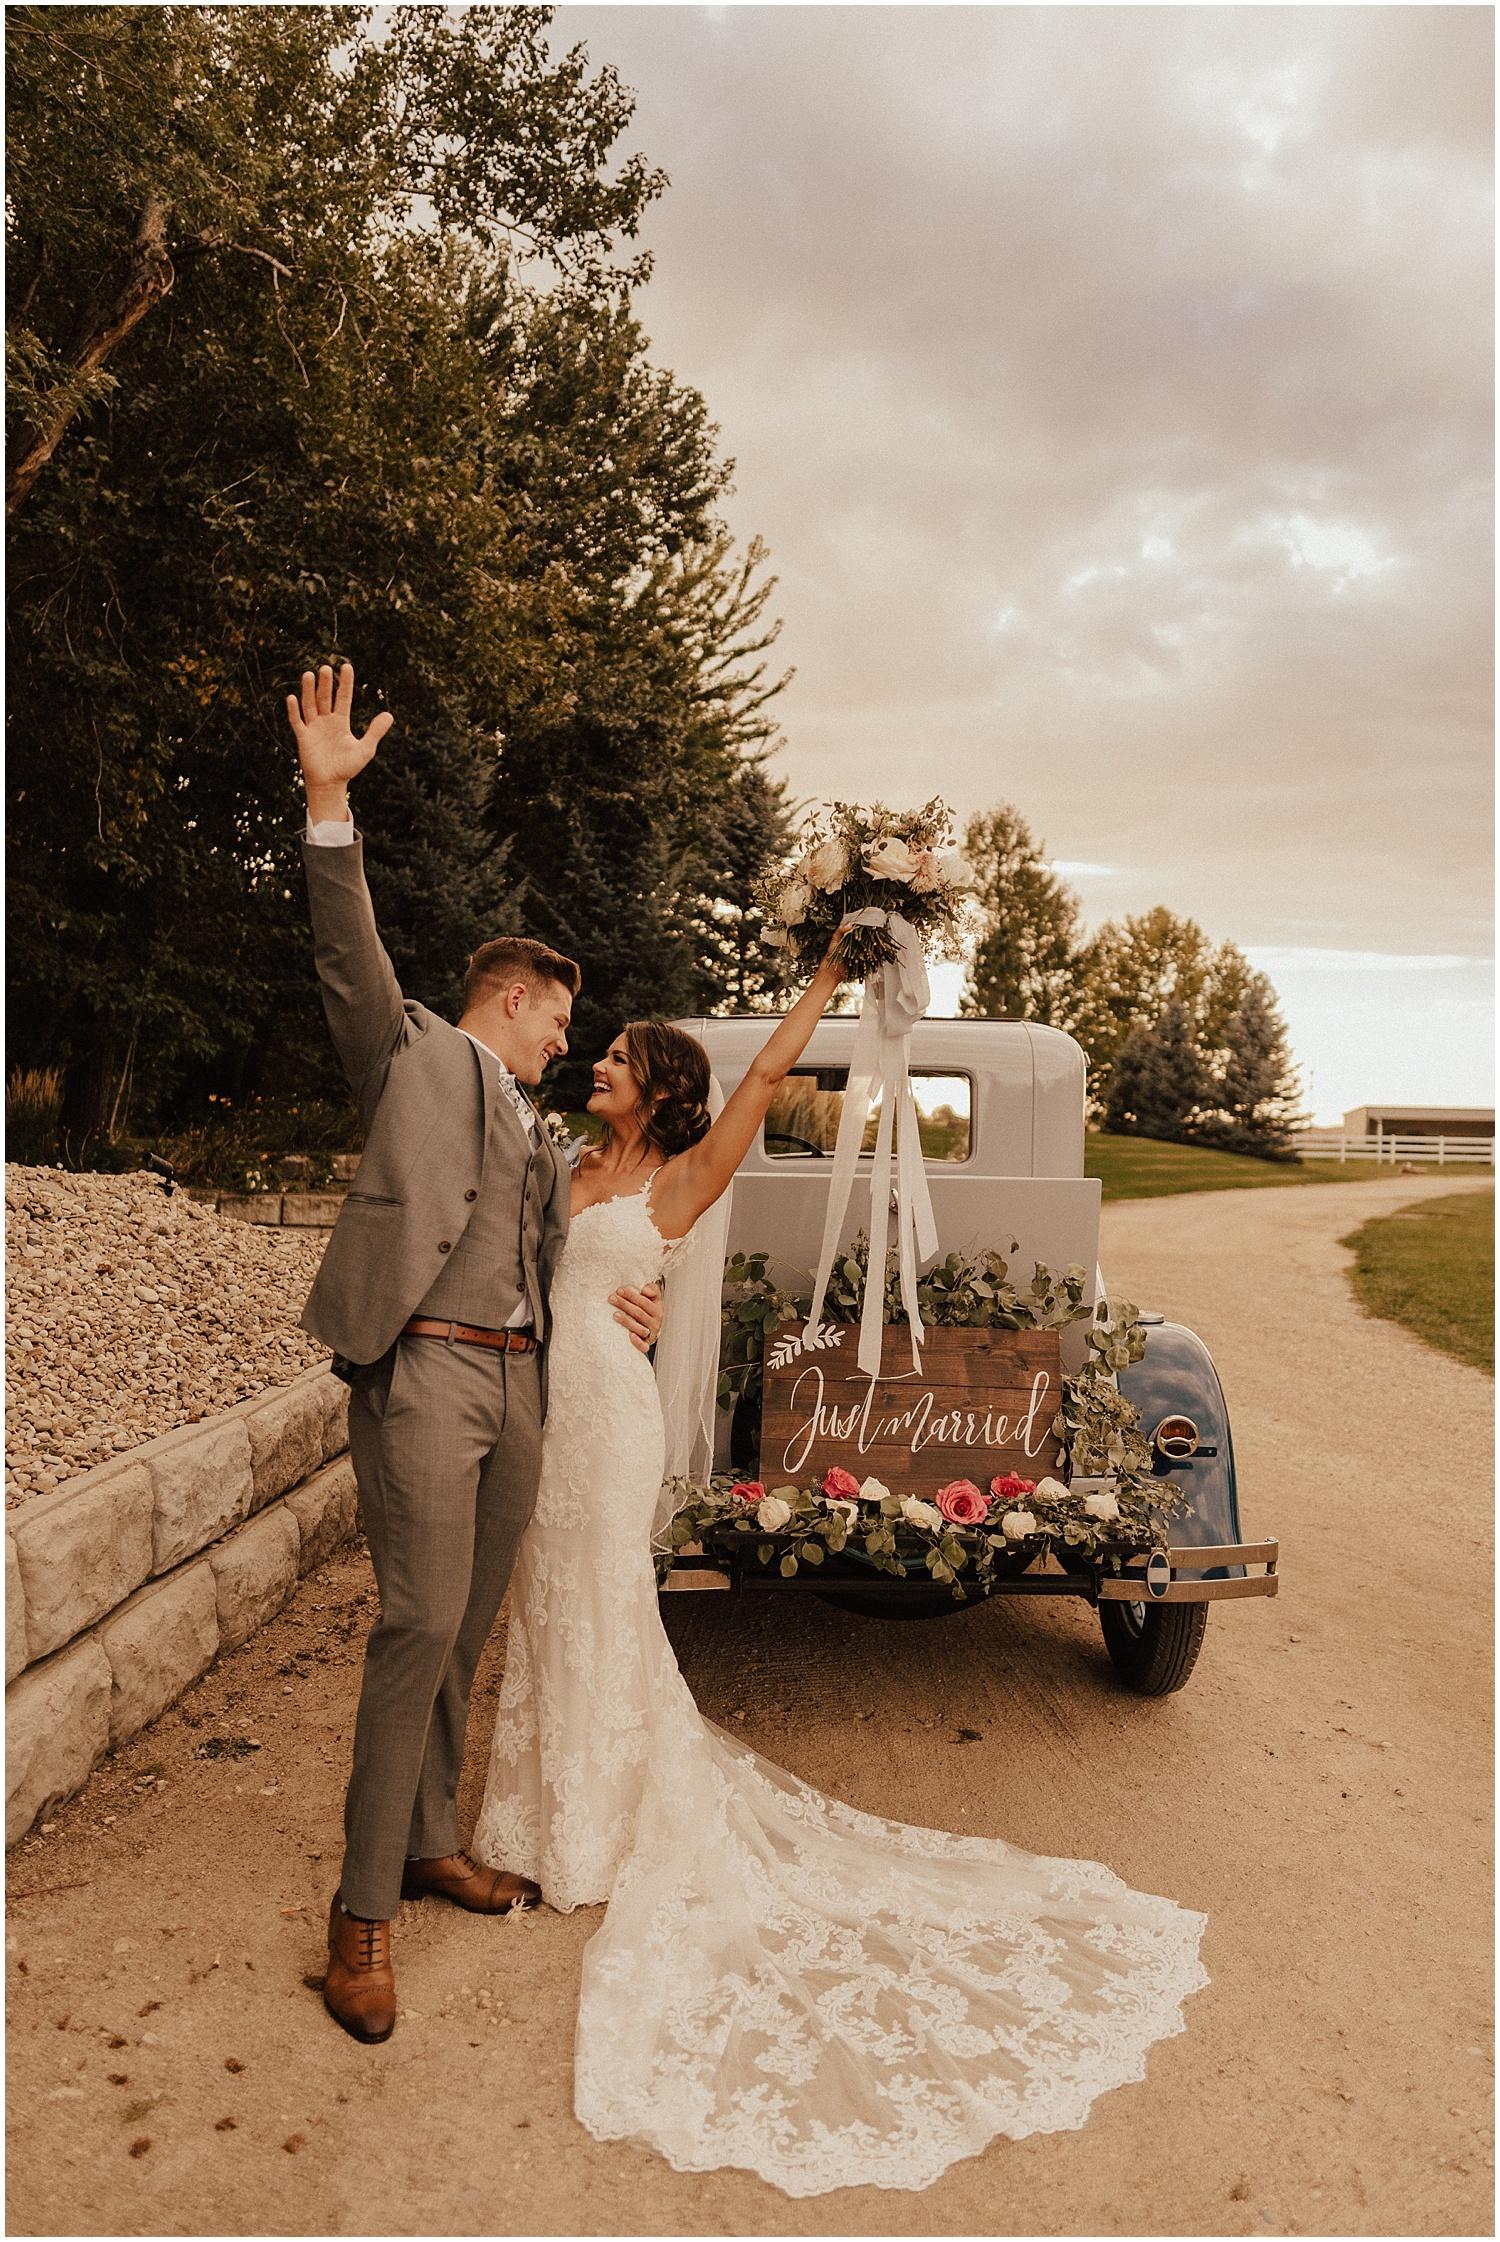 whimsical-summer-wedding-boise-idaho-las-vegas-bride177.jpg